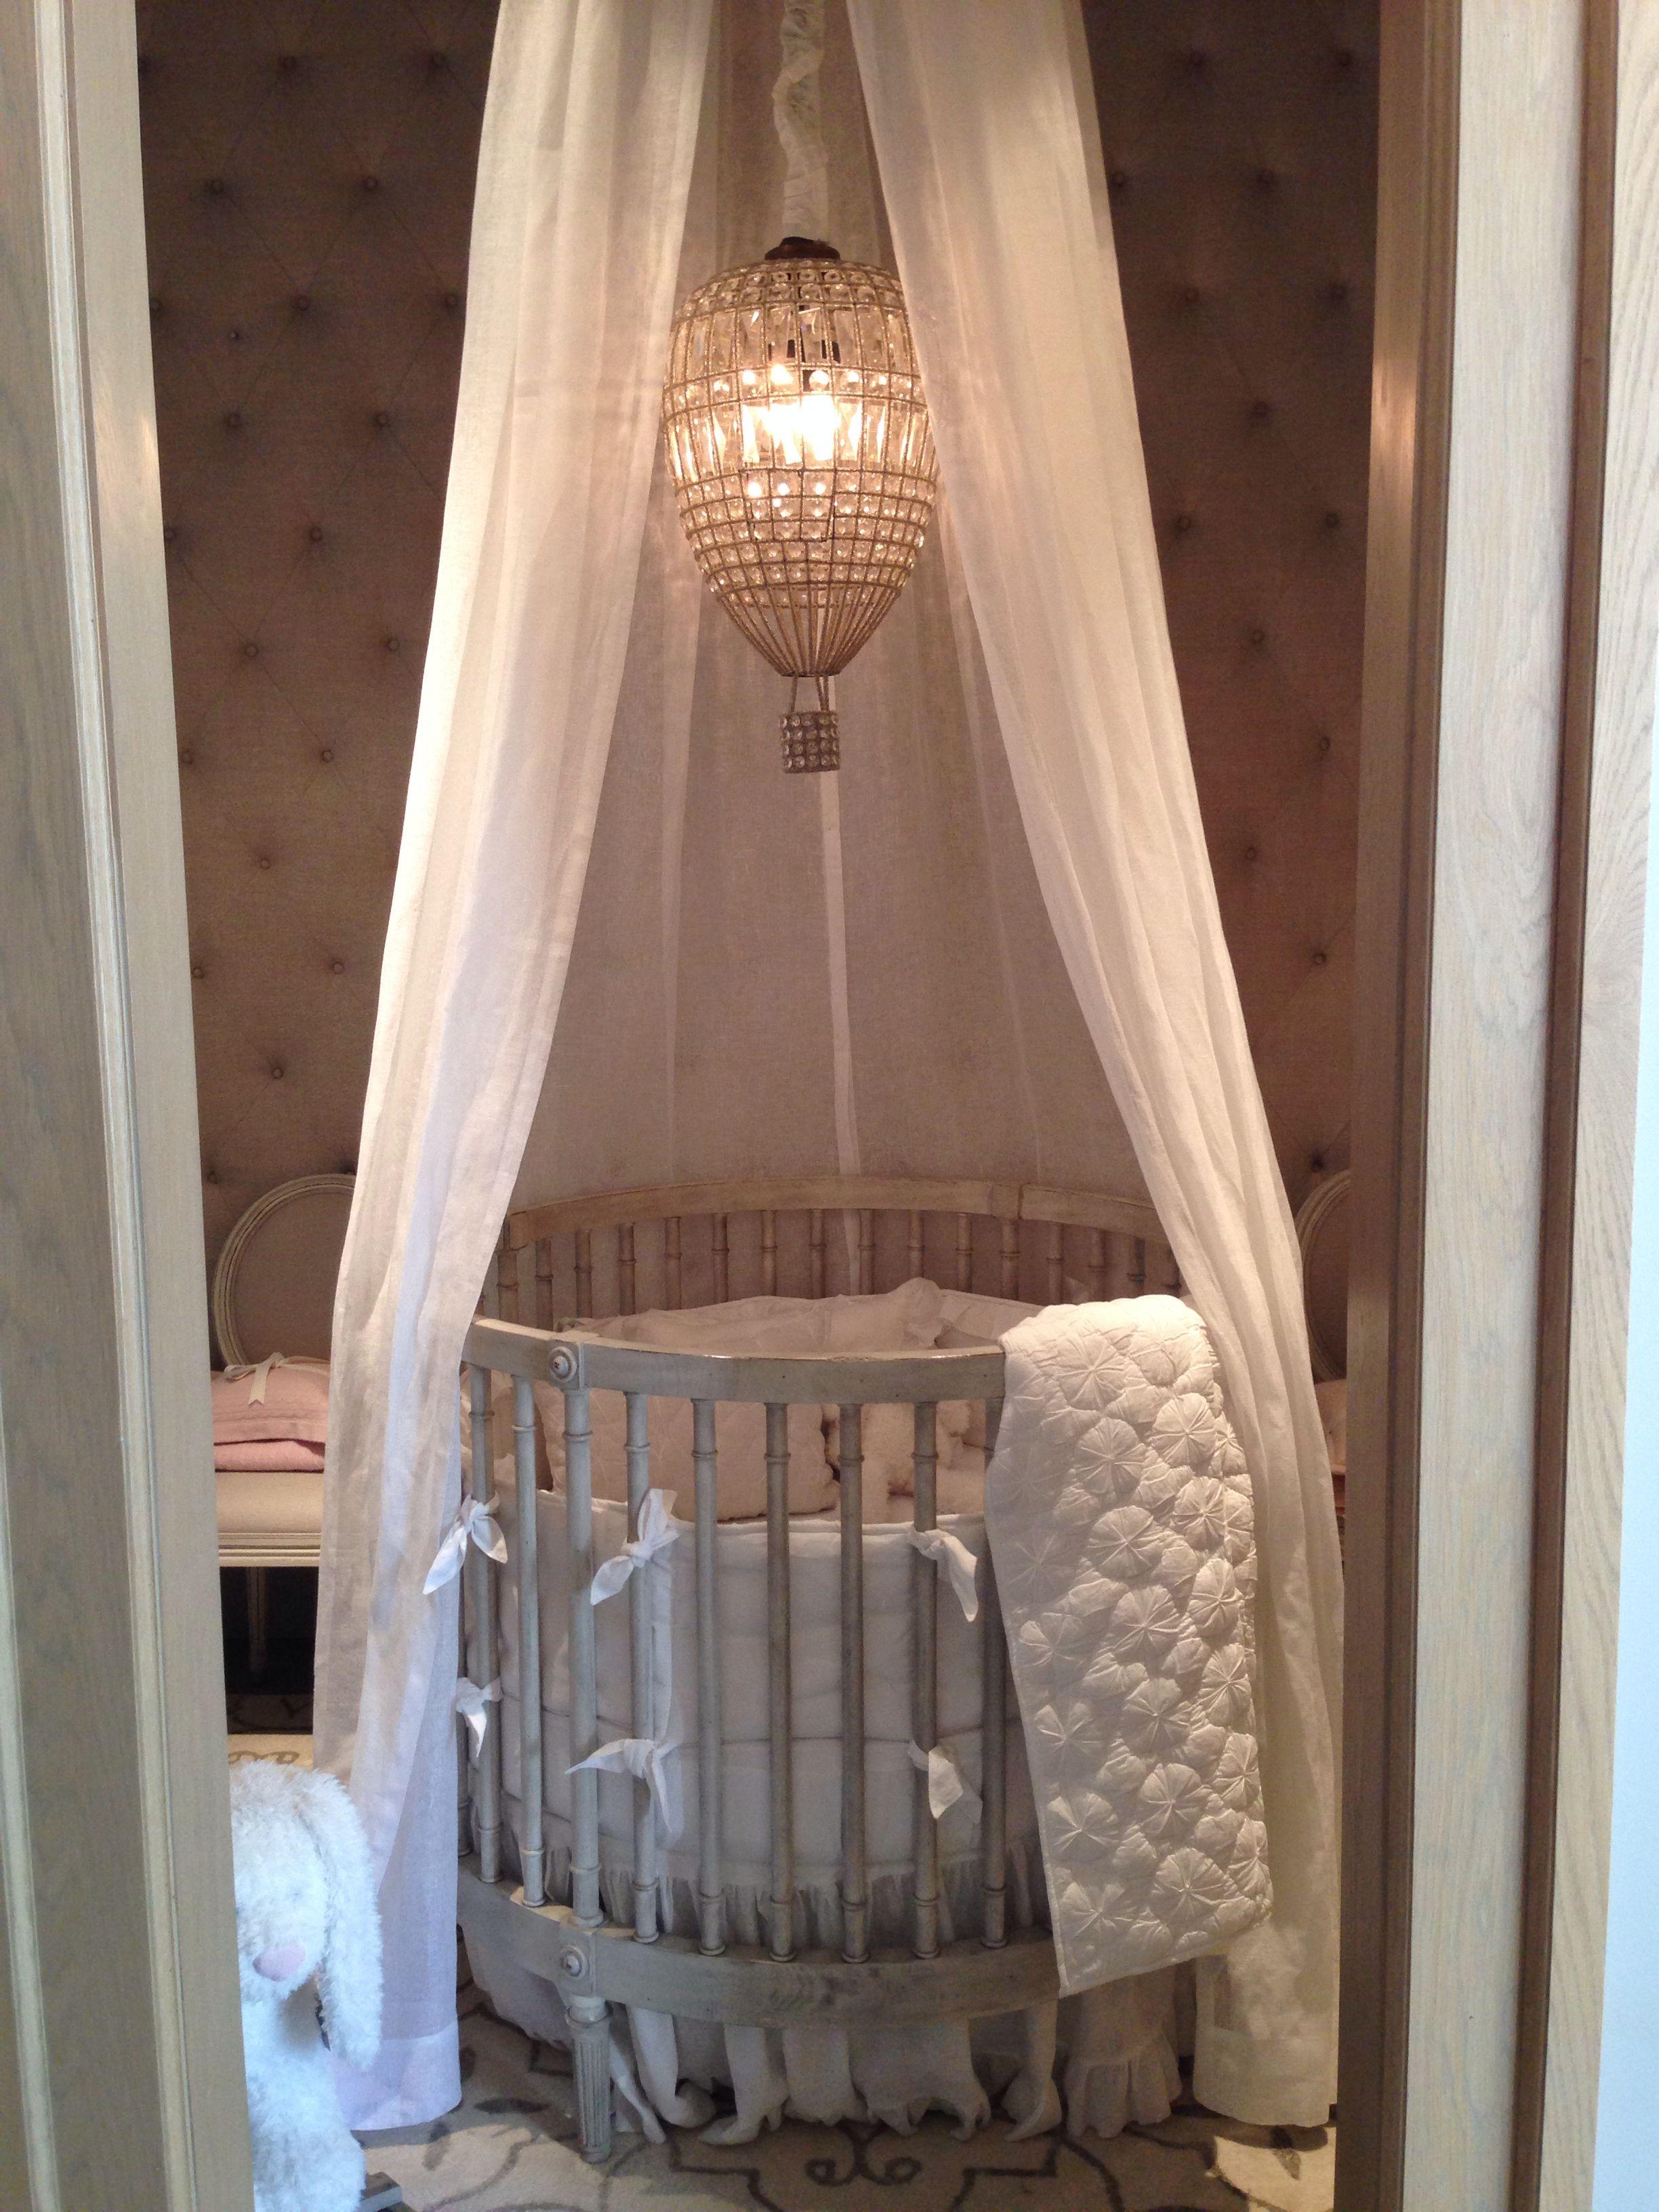 Hanging Chair Restoration Hardware Toddler Adirondack Plastic Baby And Child Girls Bedroom